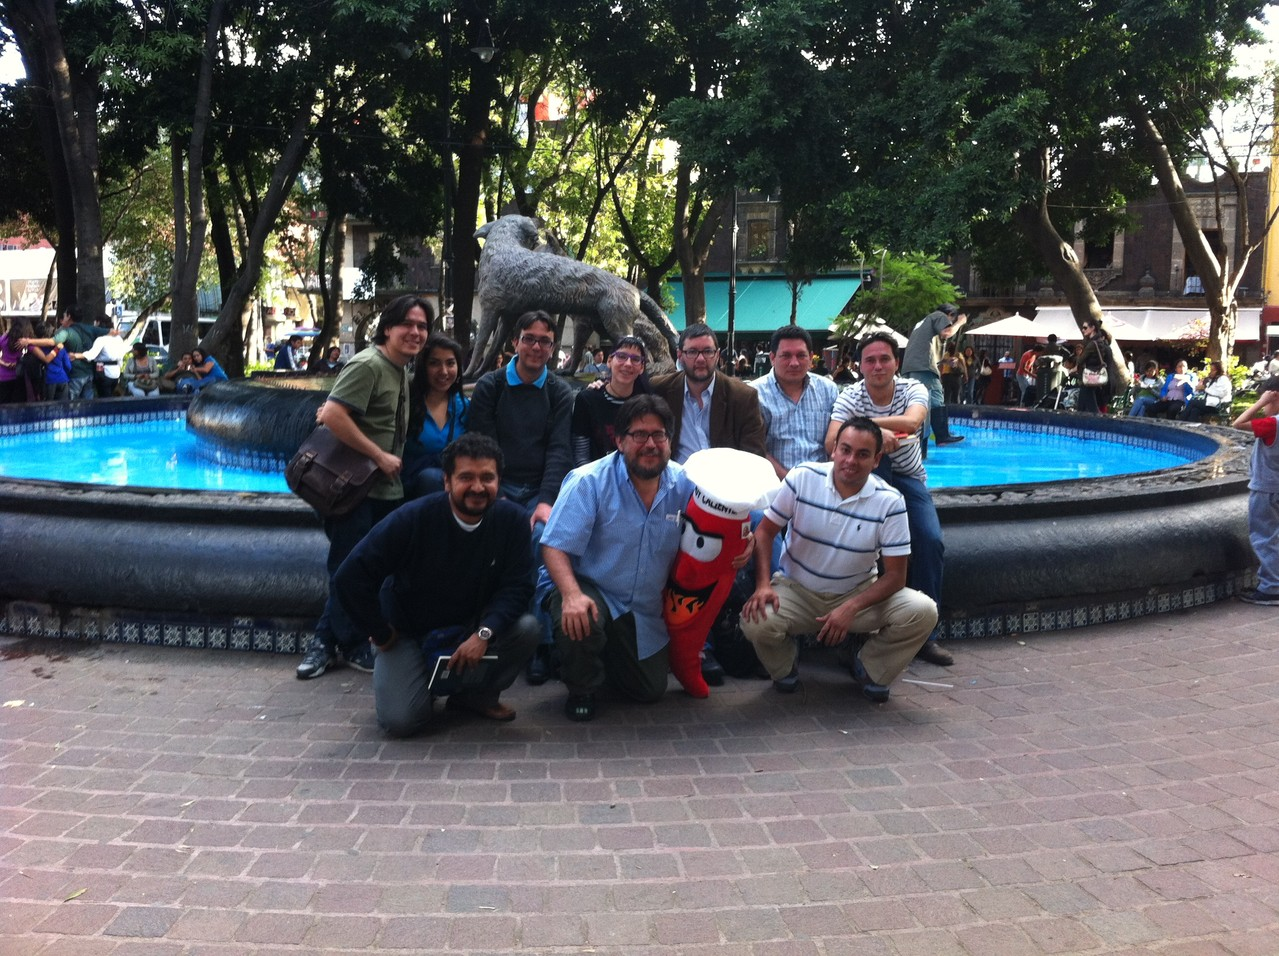 Coyoacán, con Federico Díaz Granados, Xavier Oquendo, Luis Felipe Robledo, Jorge Galán, Mijail Lamas, Alí Calderón y Glafira Rocha.